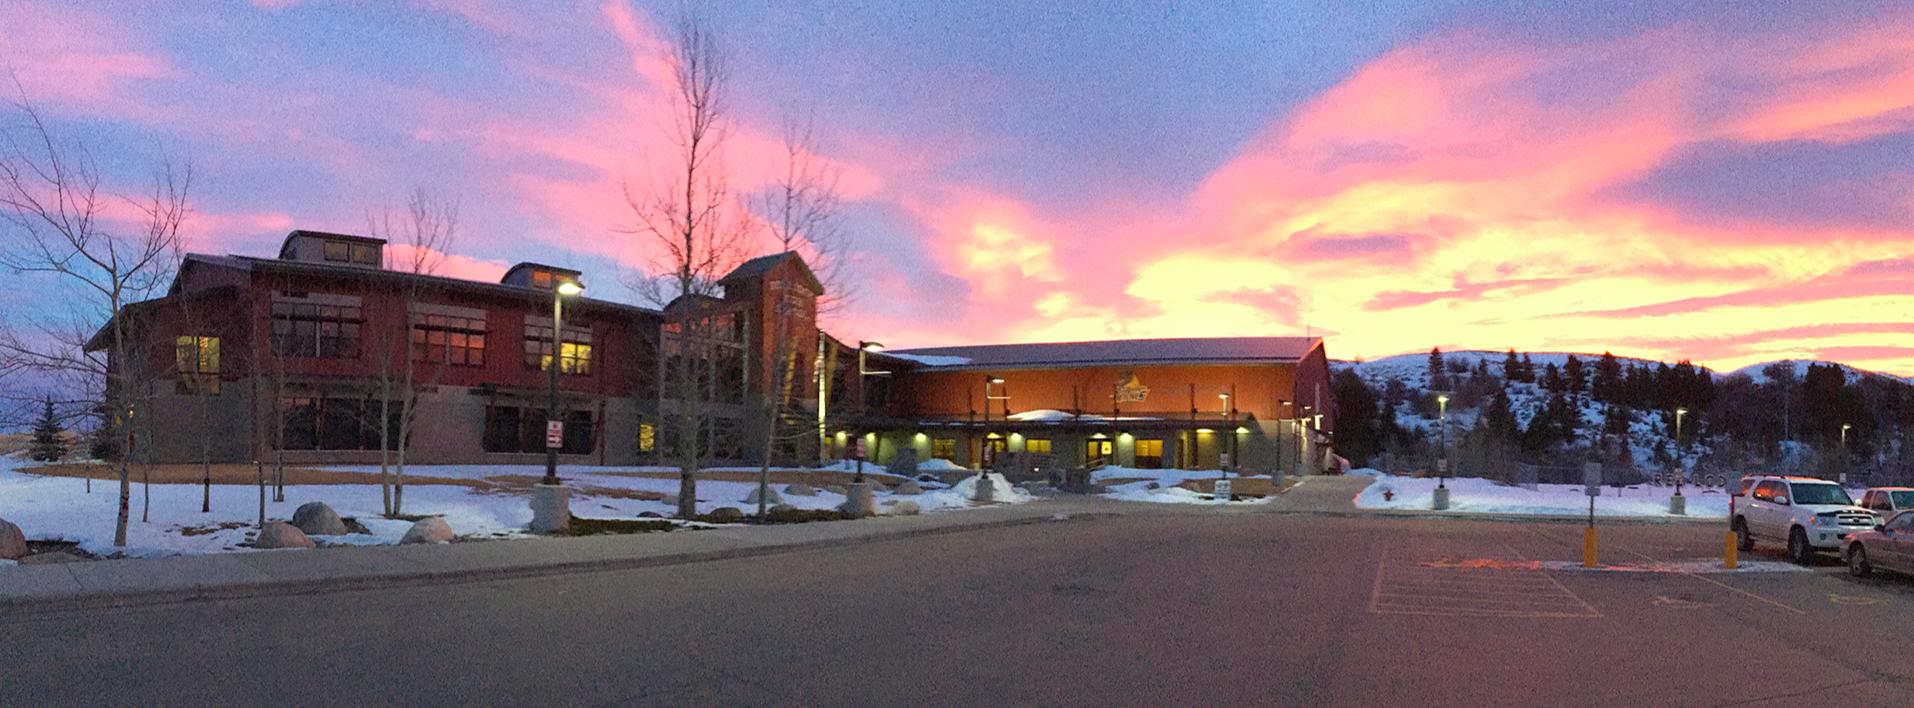 Red Lodge High School